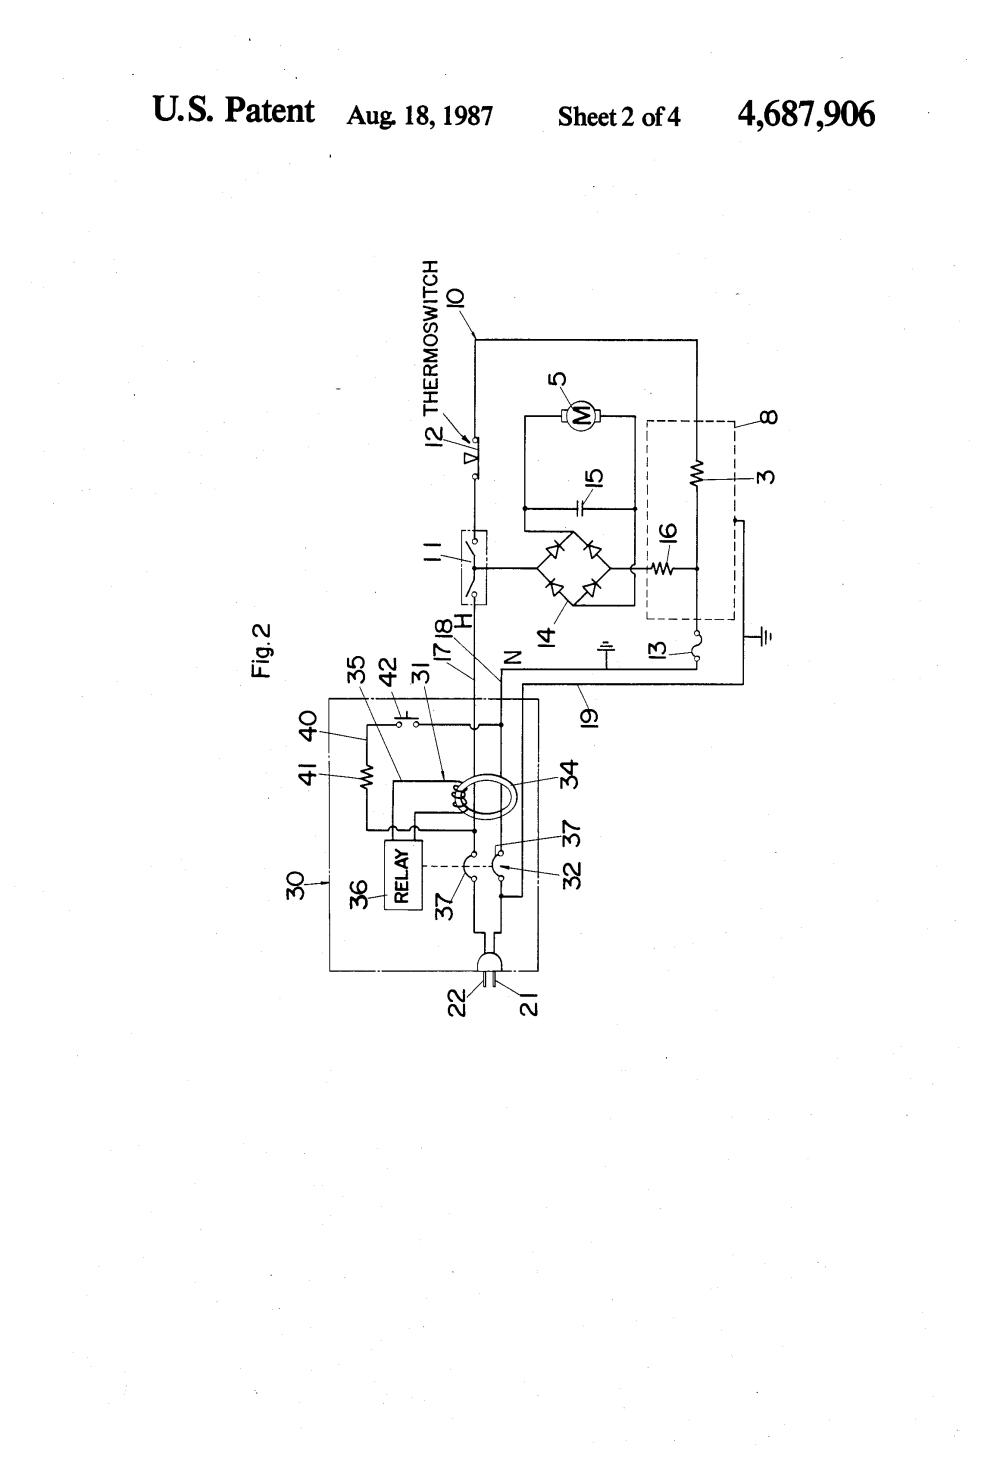 medium resolution of hair dryer wiring diagram 25 wiring diagram images wiring an electric dryer wiring circuit conair hair